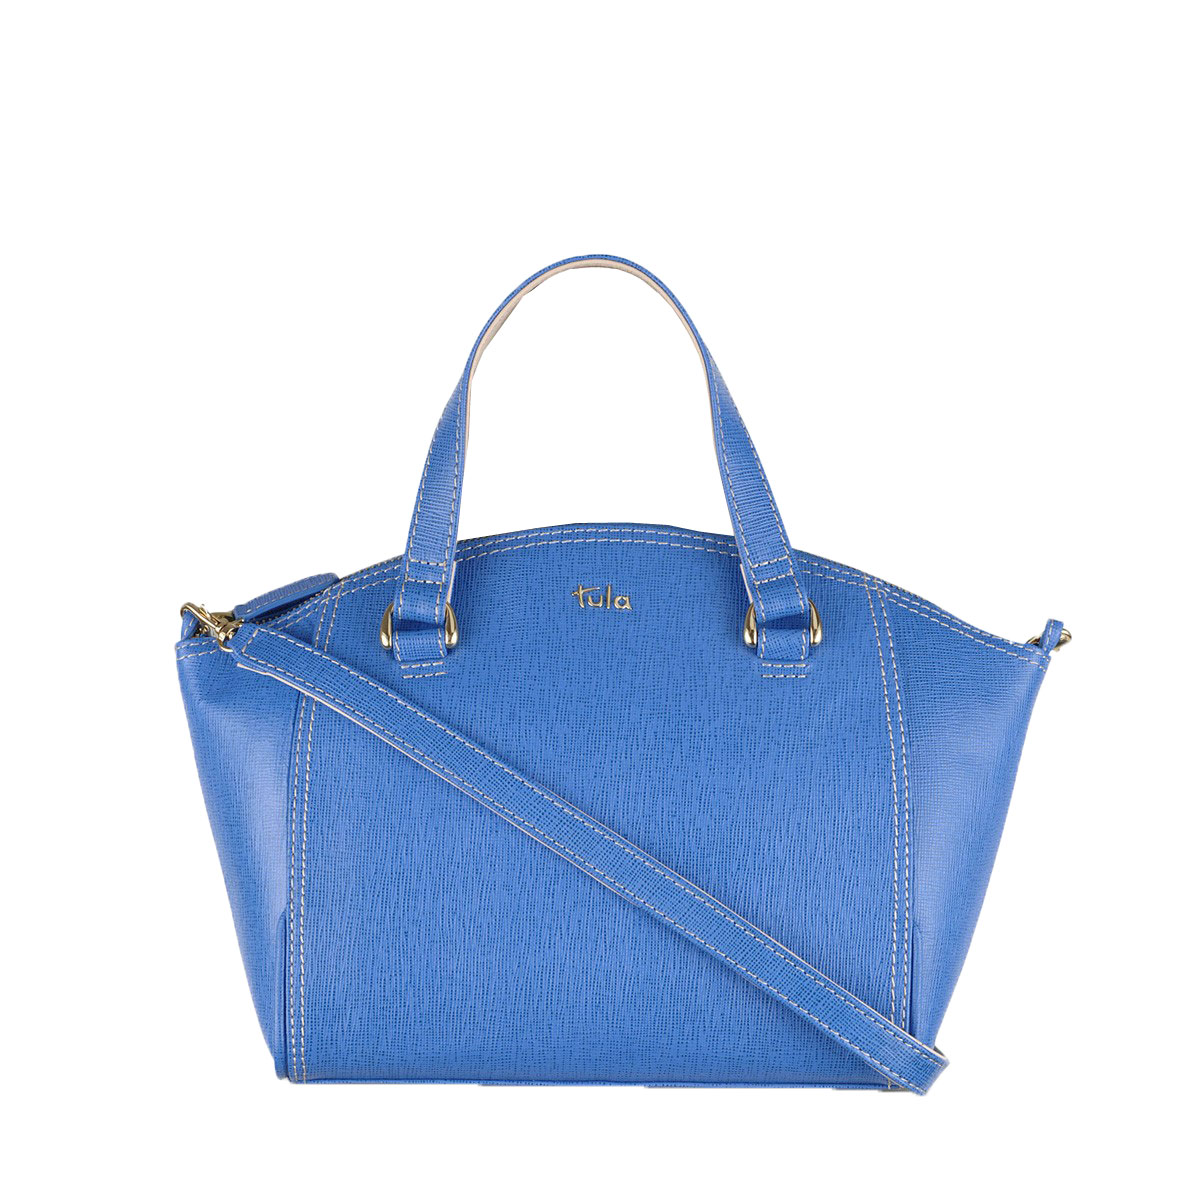 Tula Saffiano Zip Top Tote Bag